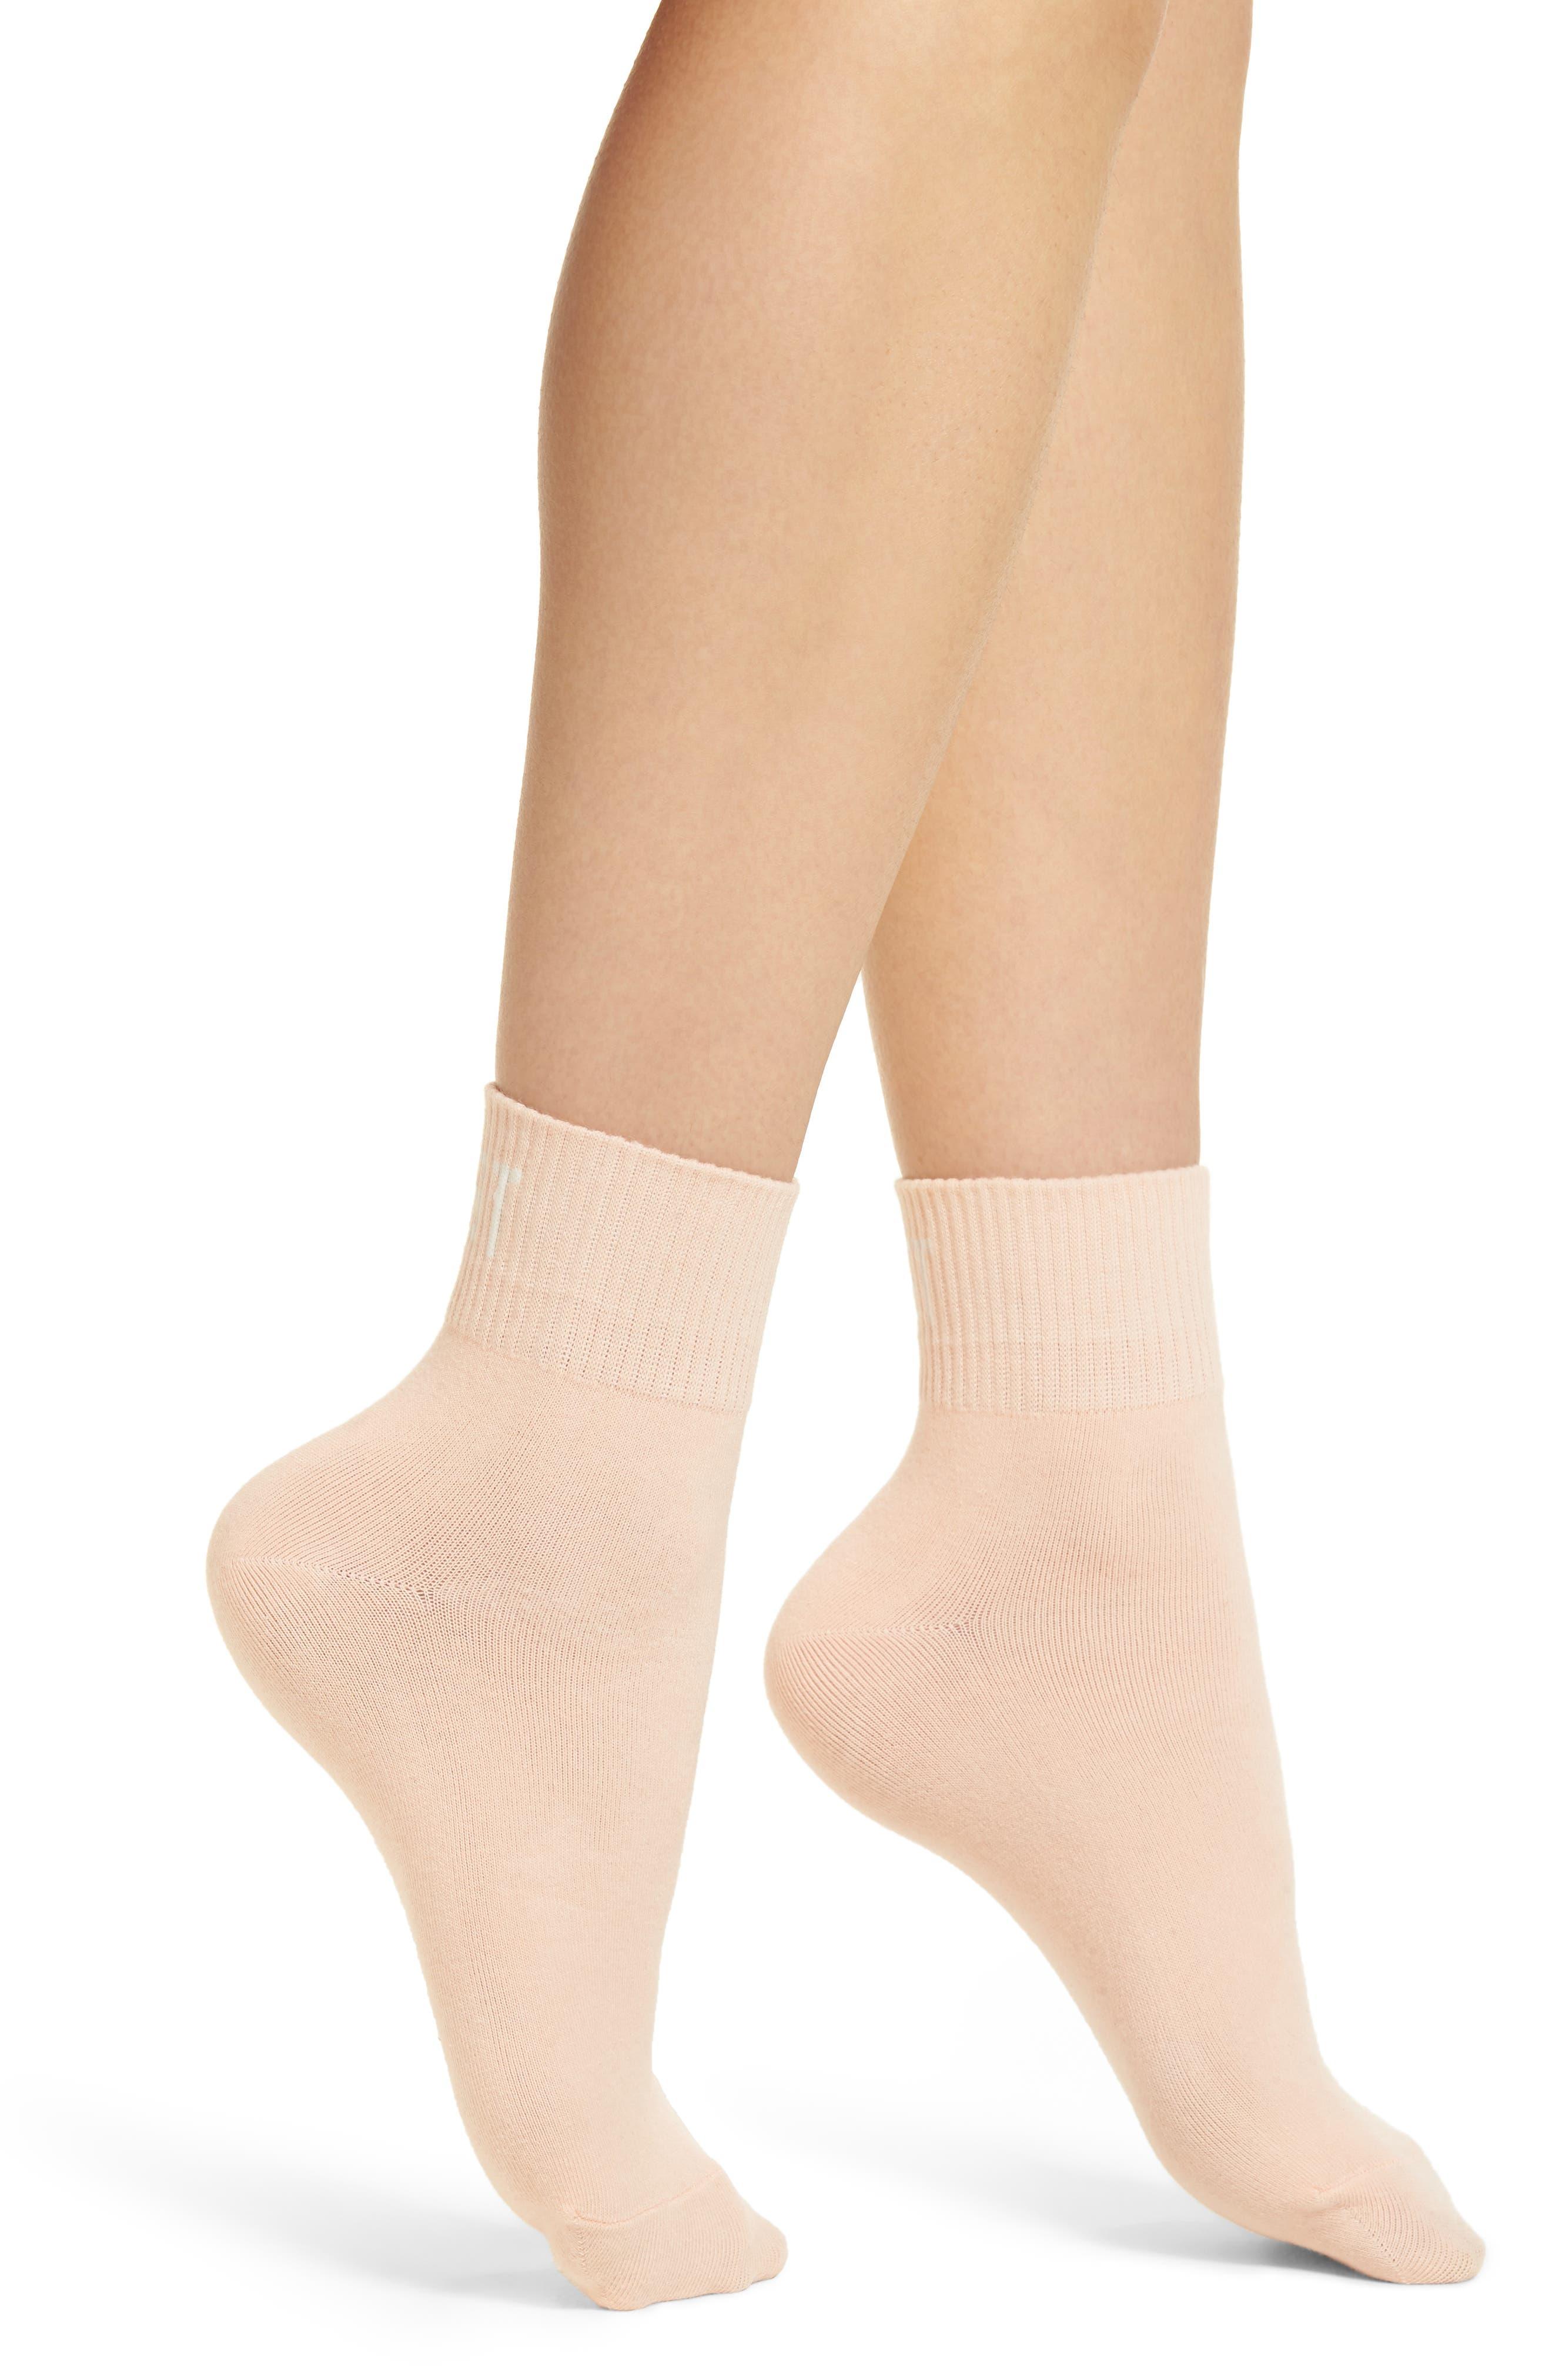 Get Lost Ankle Socks,                         Main,                         color, 630